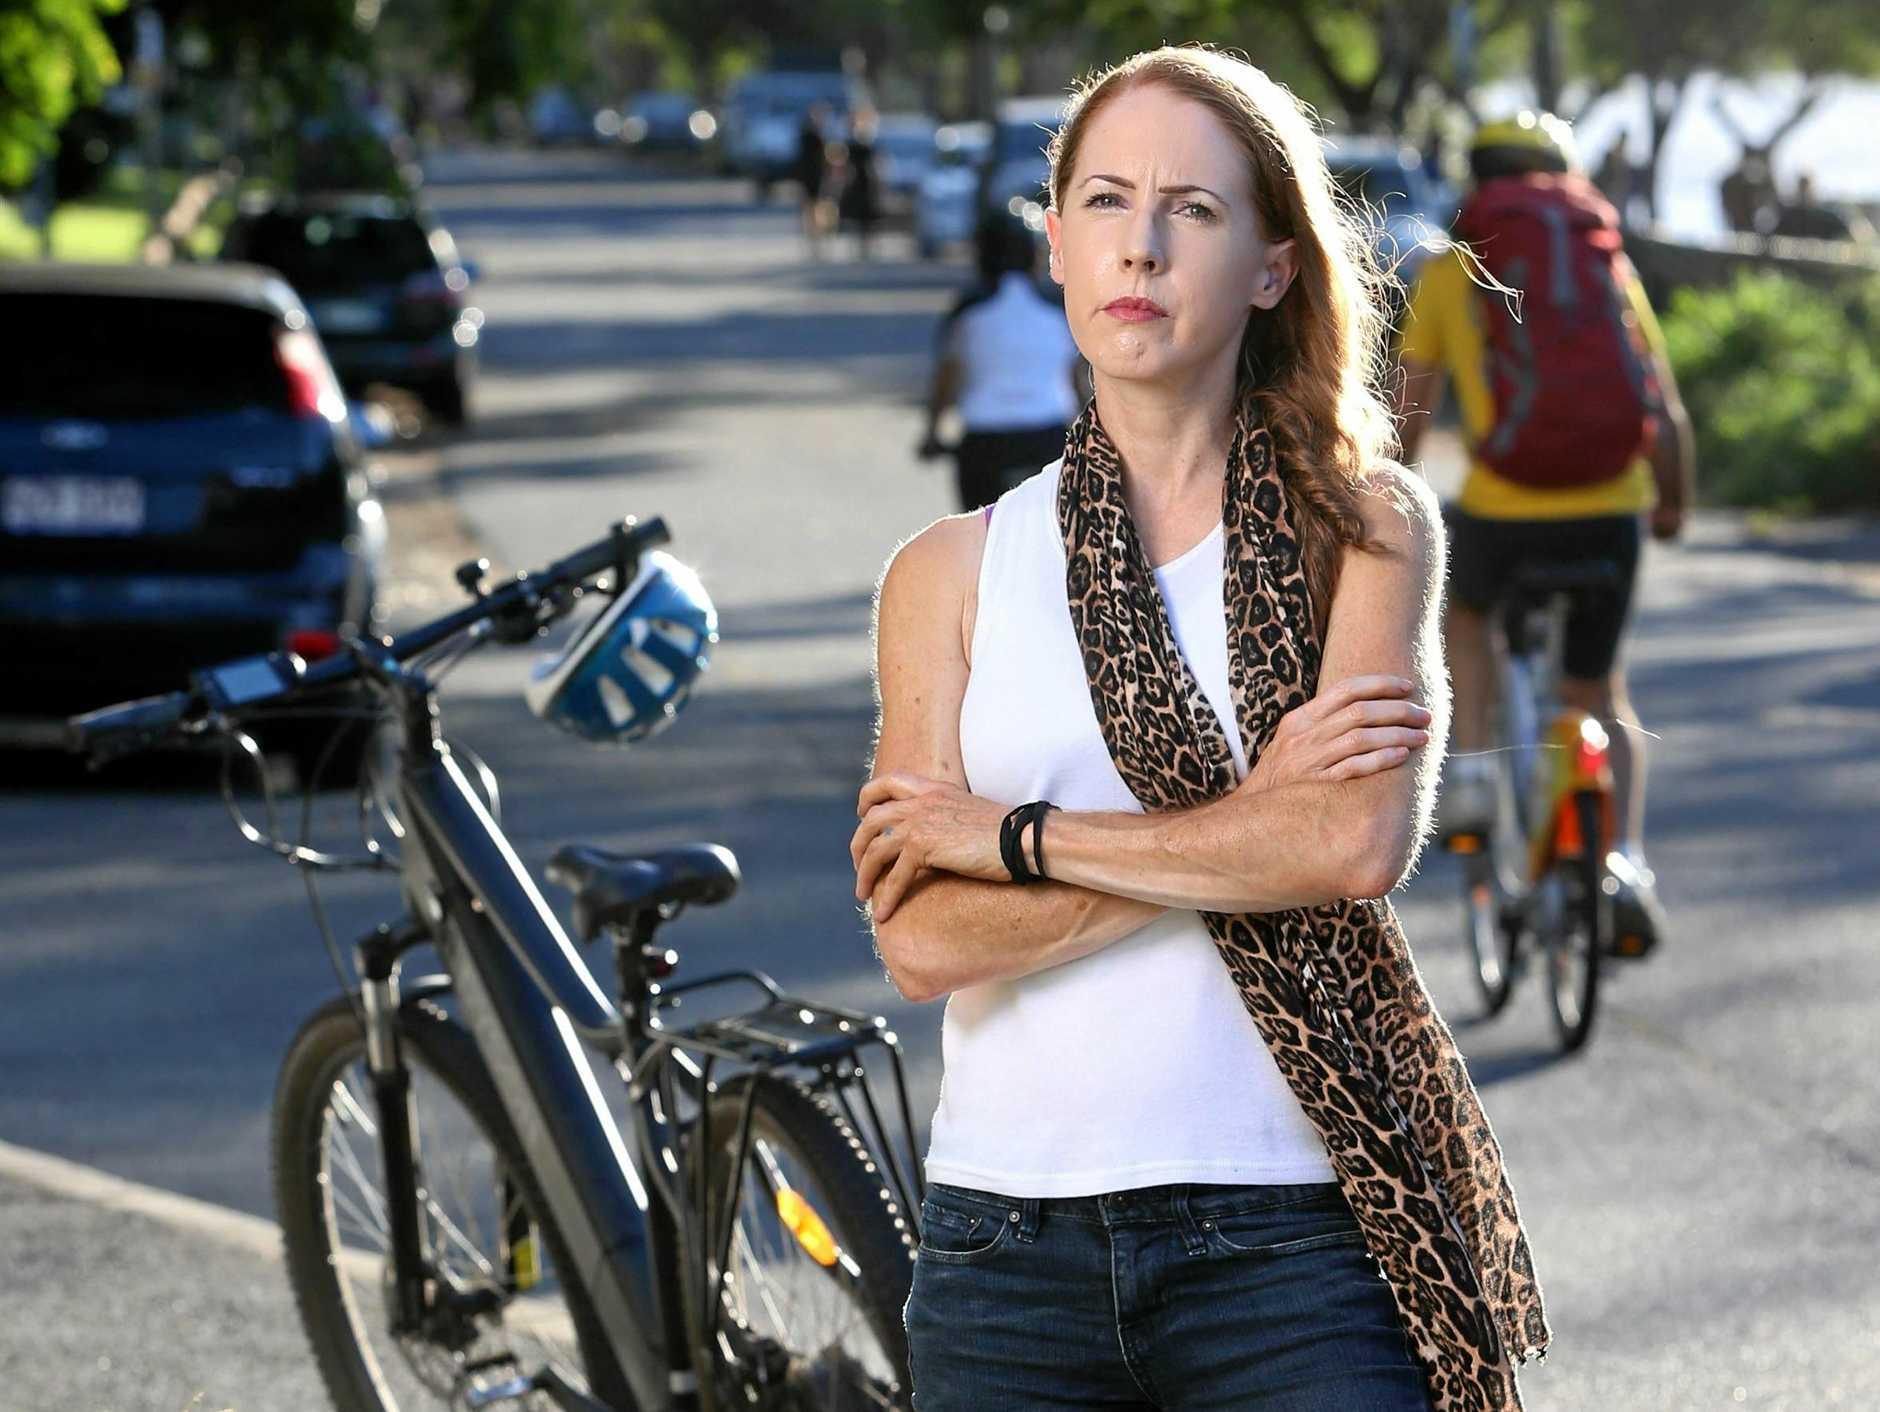 Bicycle Queensland CEO Anne Savage.